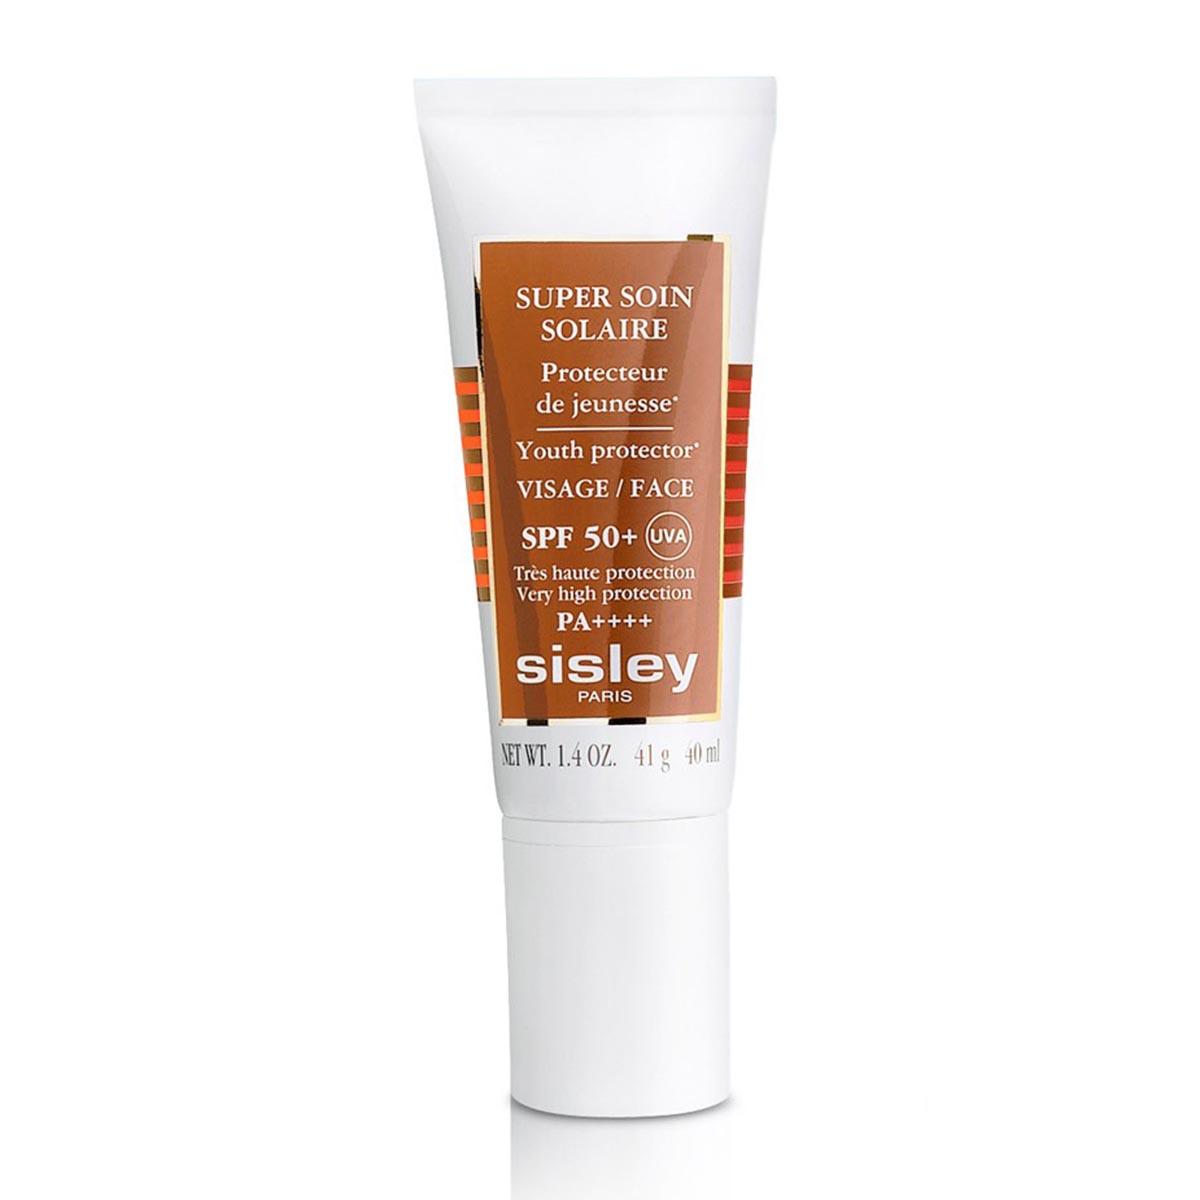 Sisley super soin solaire visage spf50 uva creme 40ml